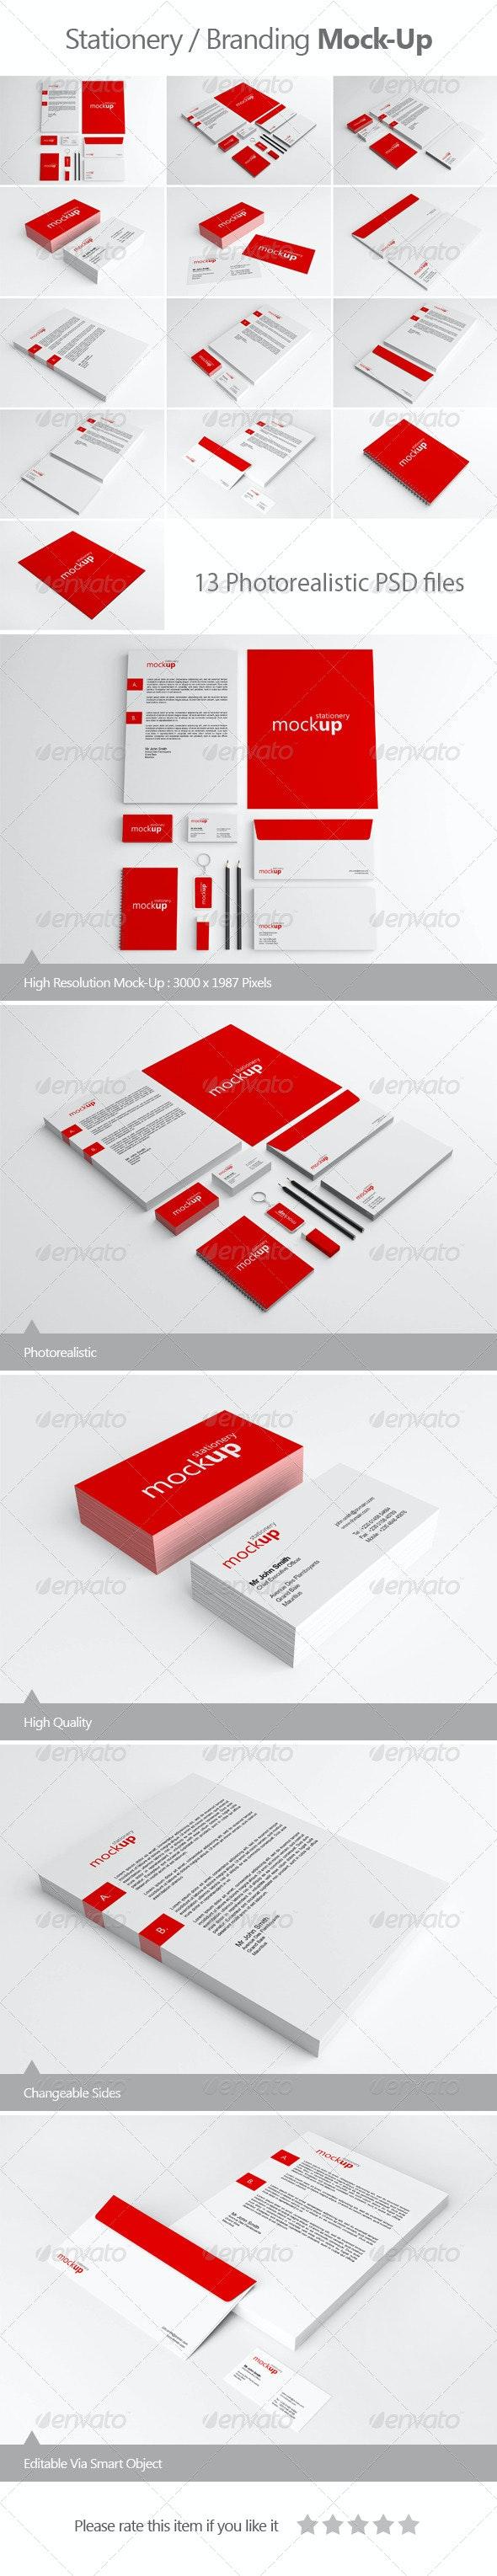 Stationery / Branding Mock-Up - Stationery Print